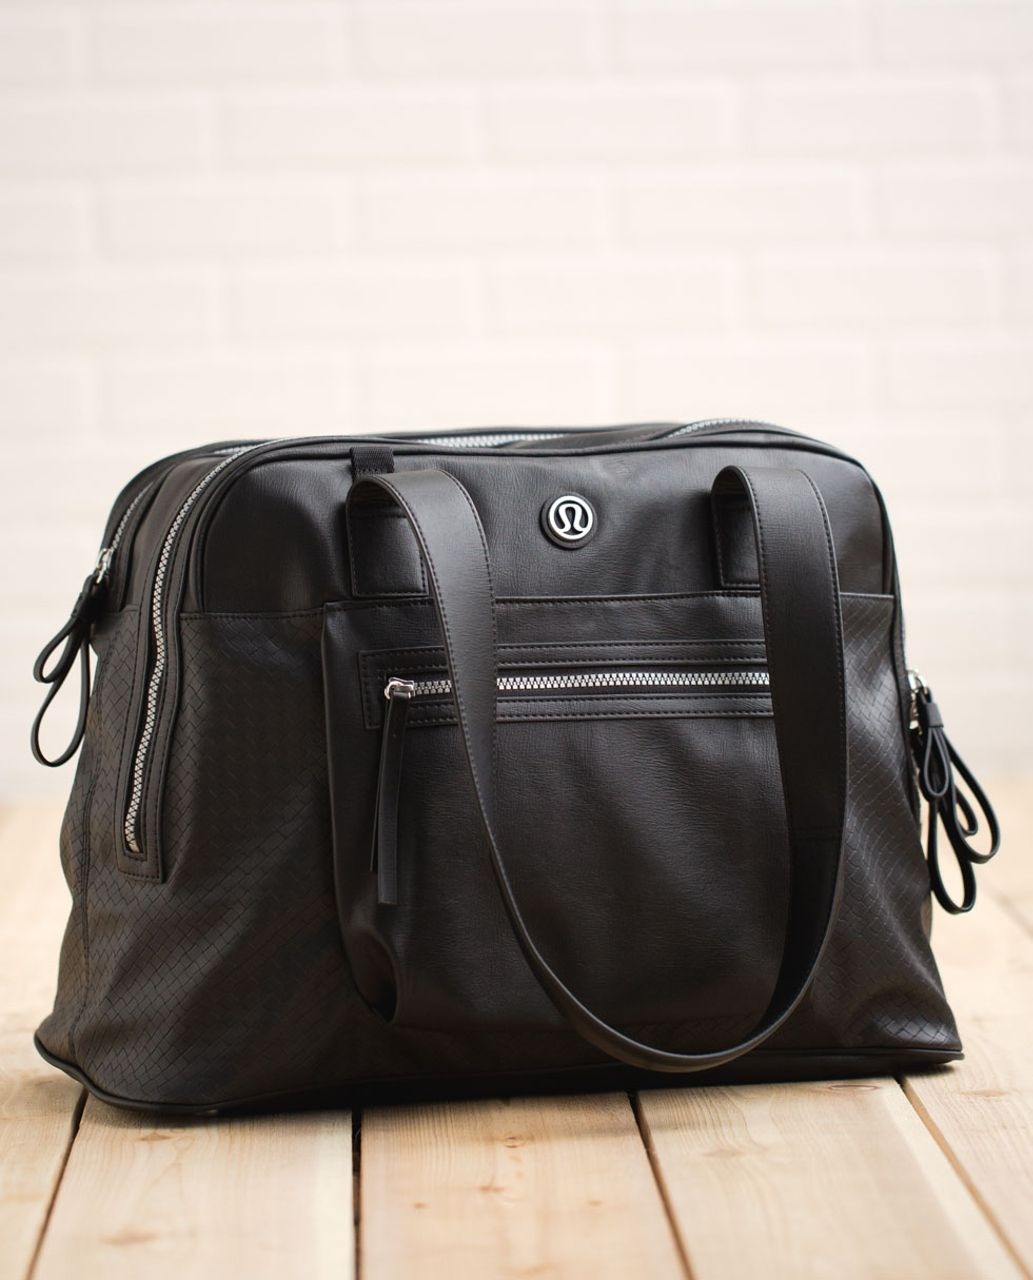 Lululemon Sweat Go Bag Black